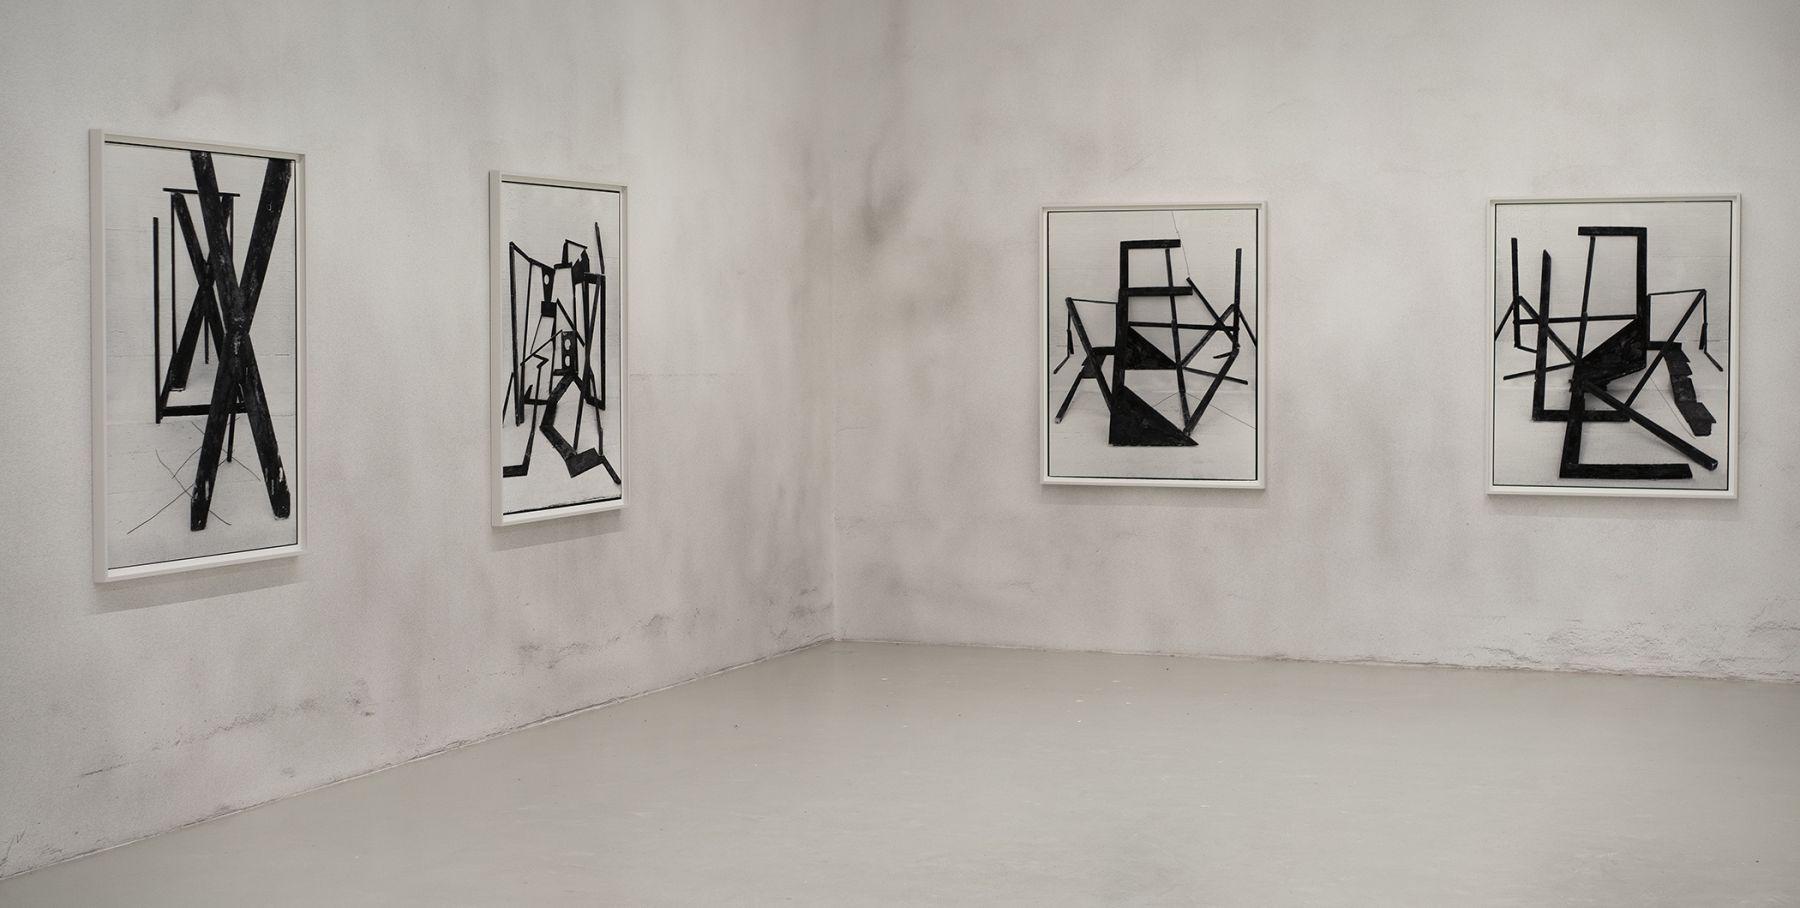 American Type installation view at Galerie Lisa Kandlhofer, Vienna